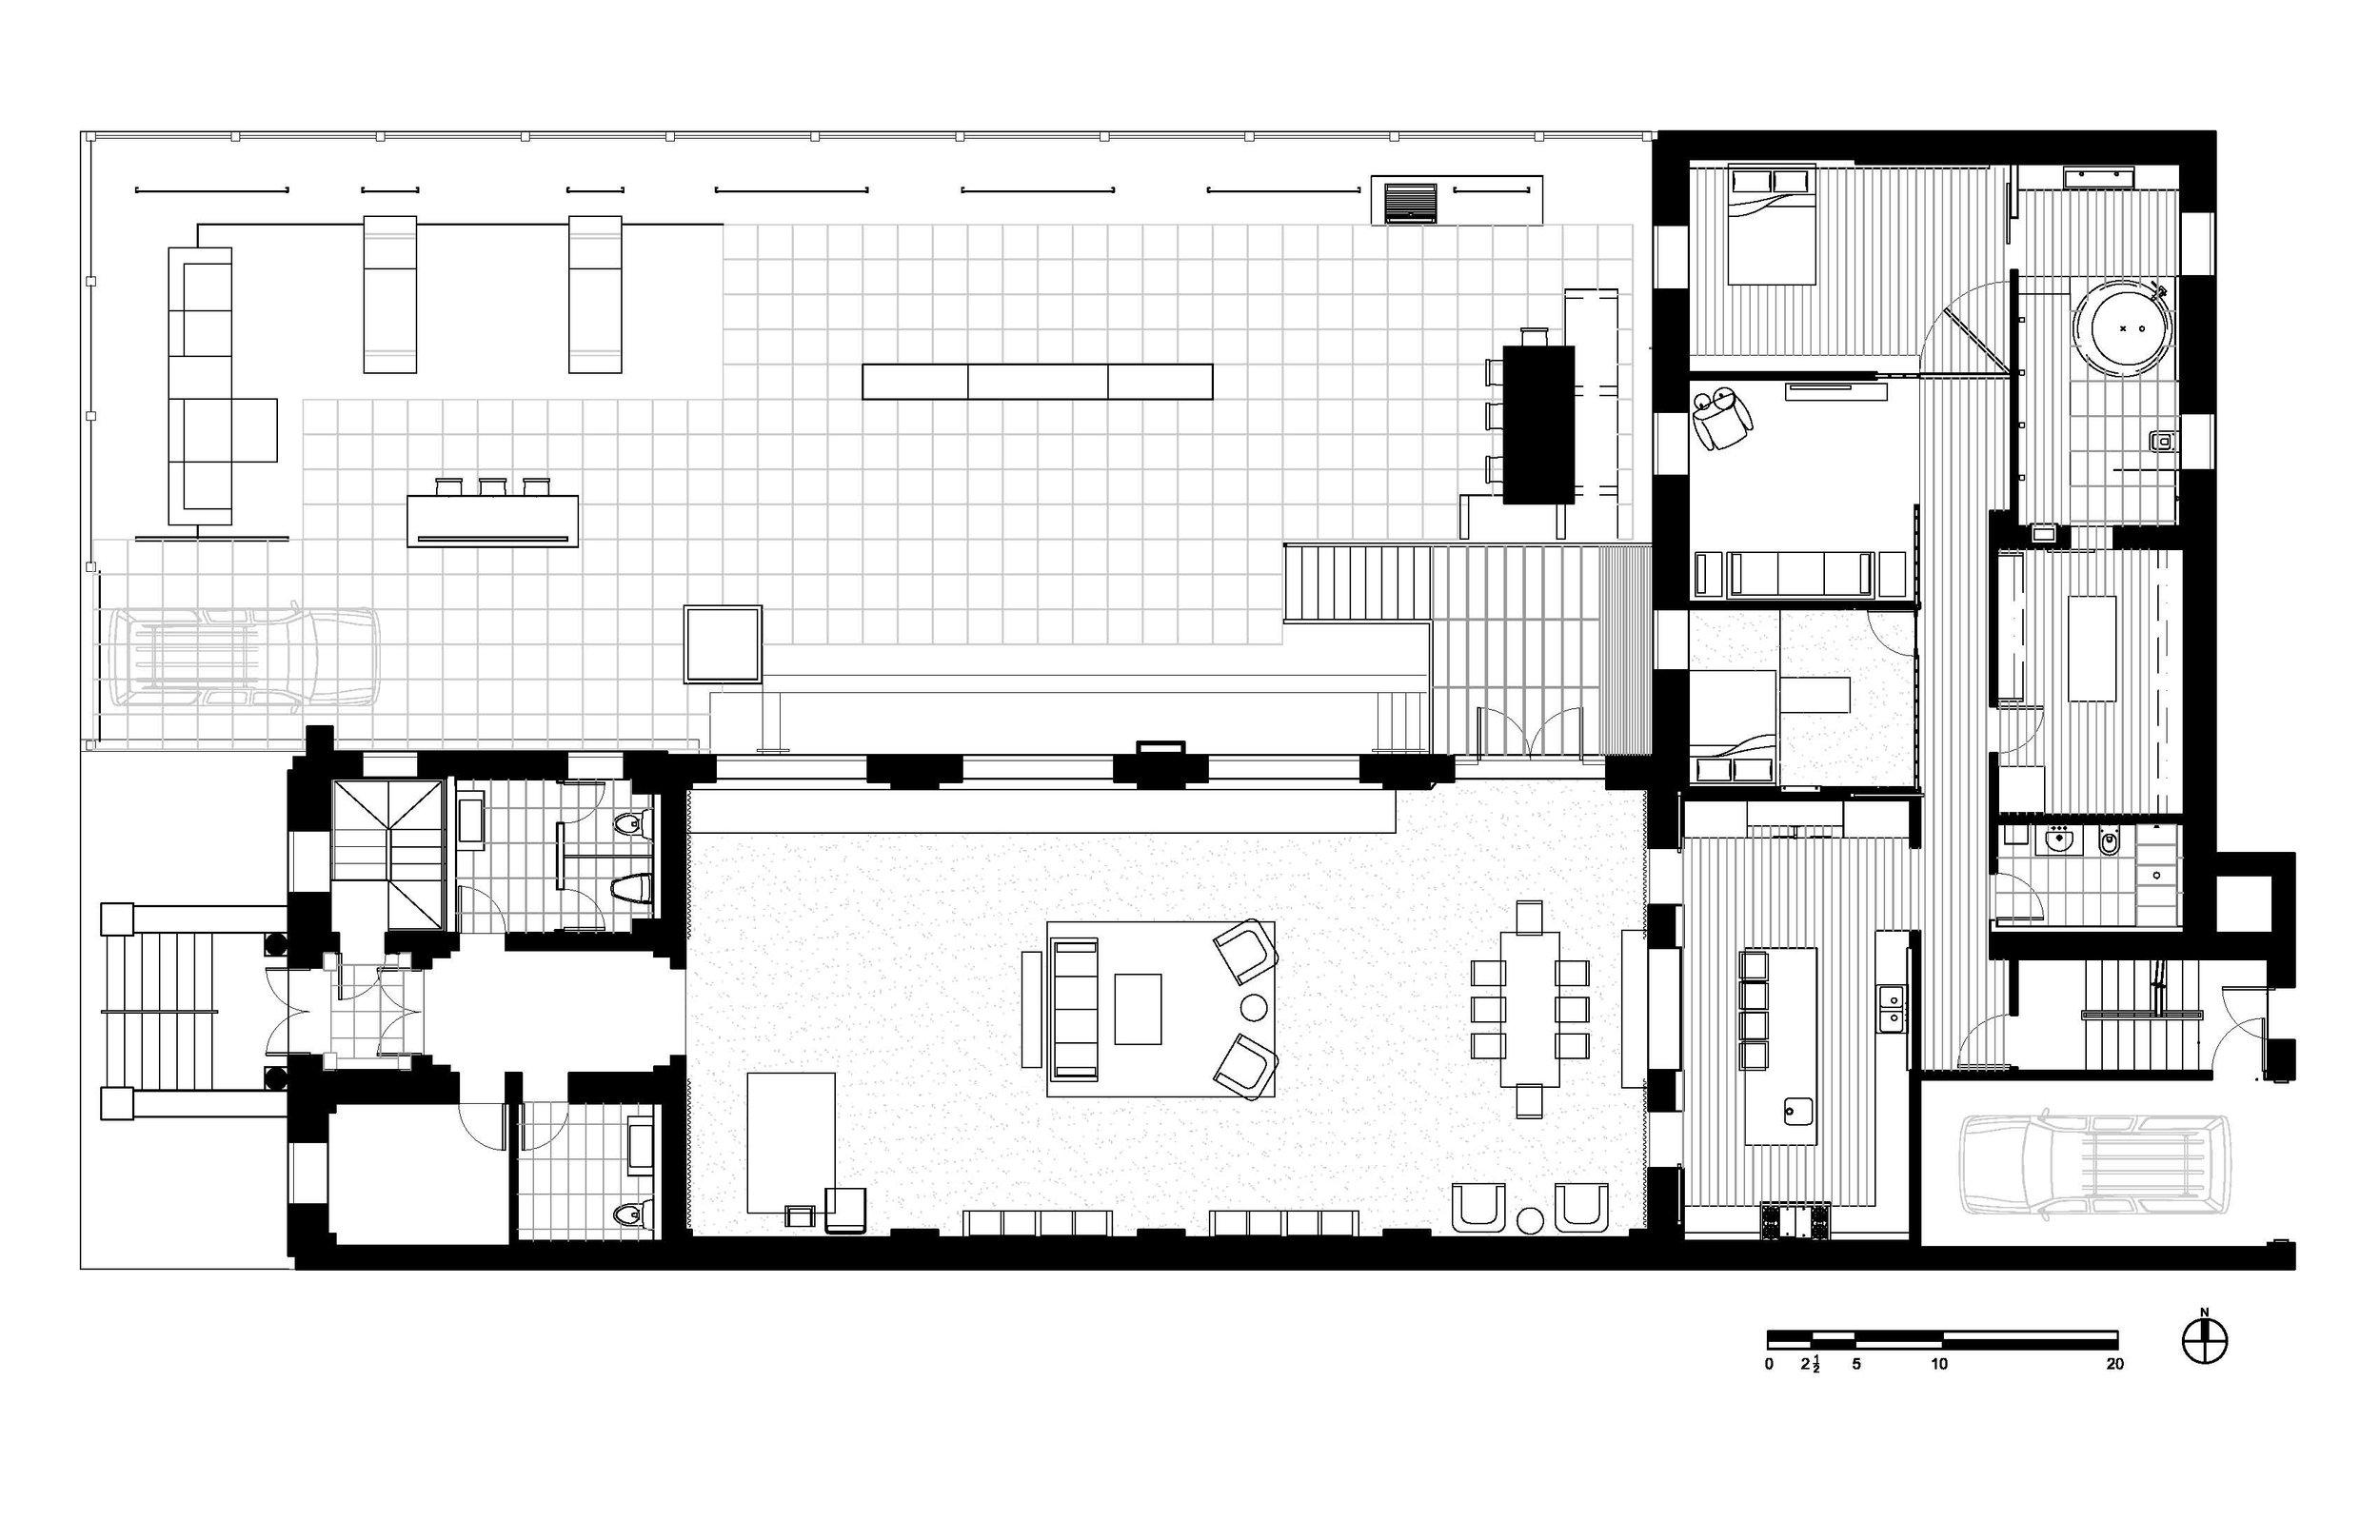 WolcottBathhouse_04.jpg